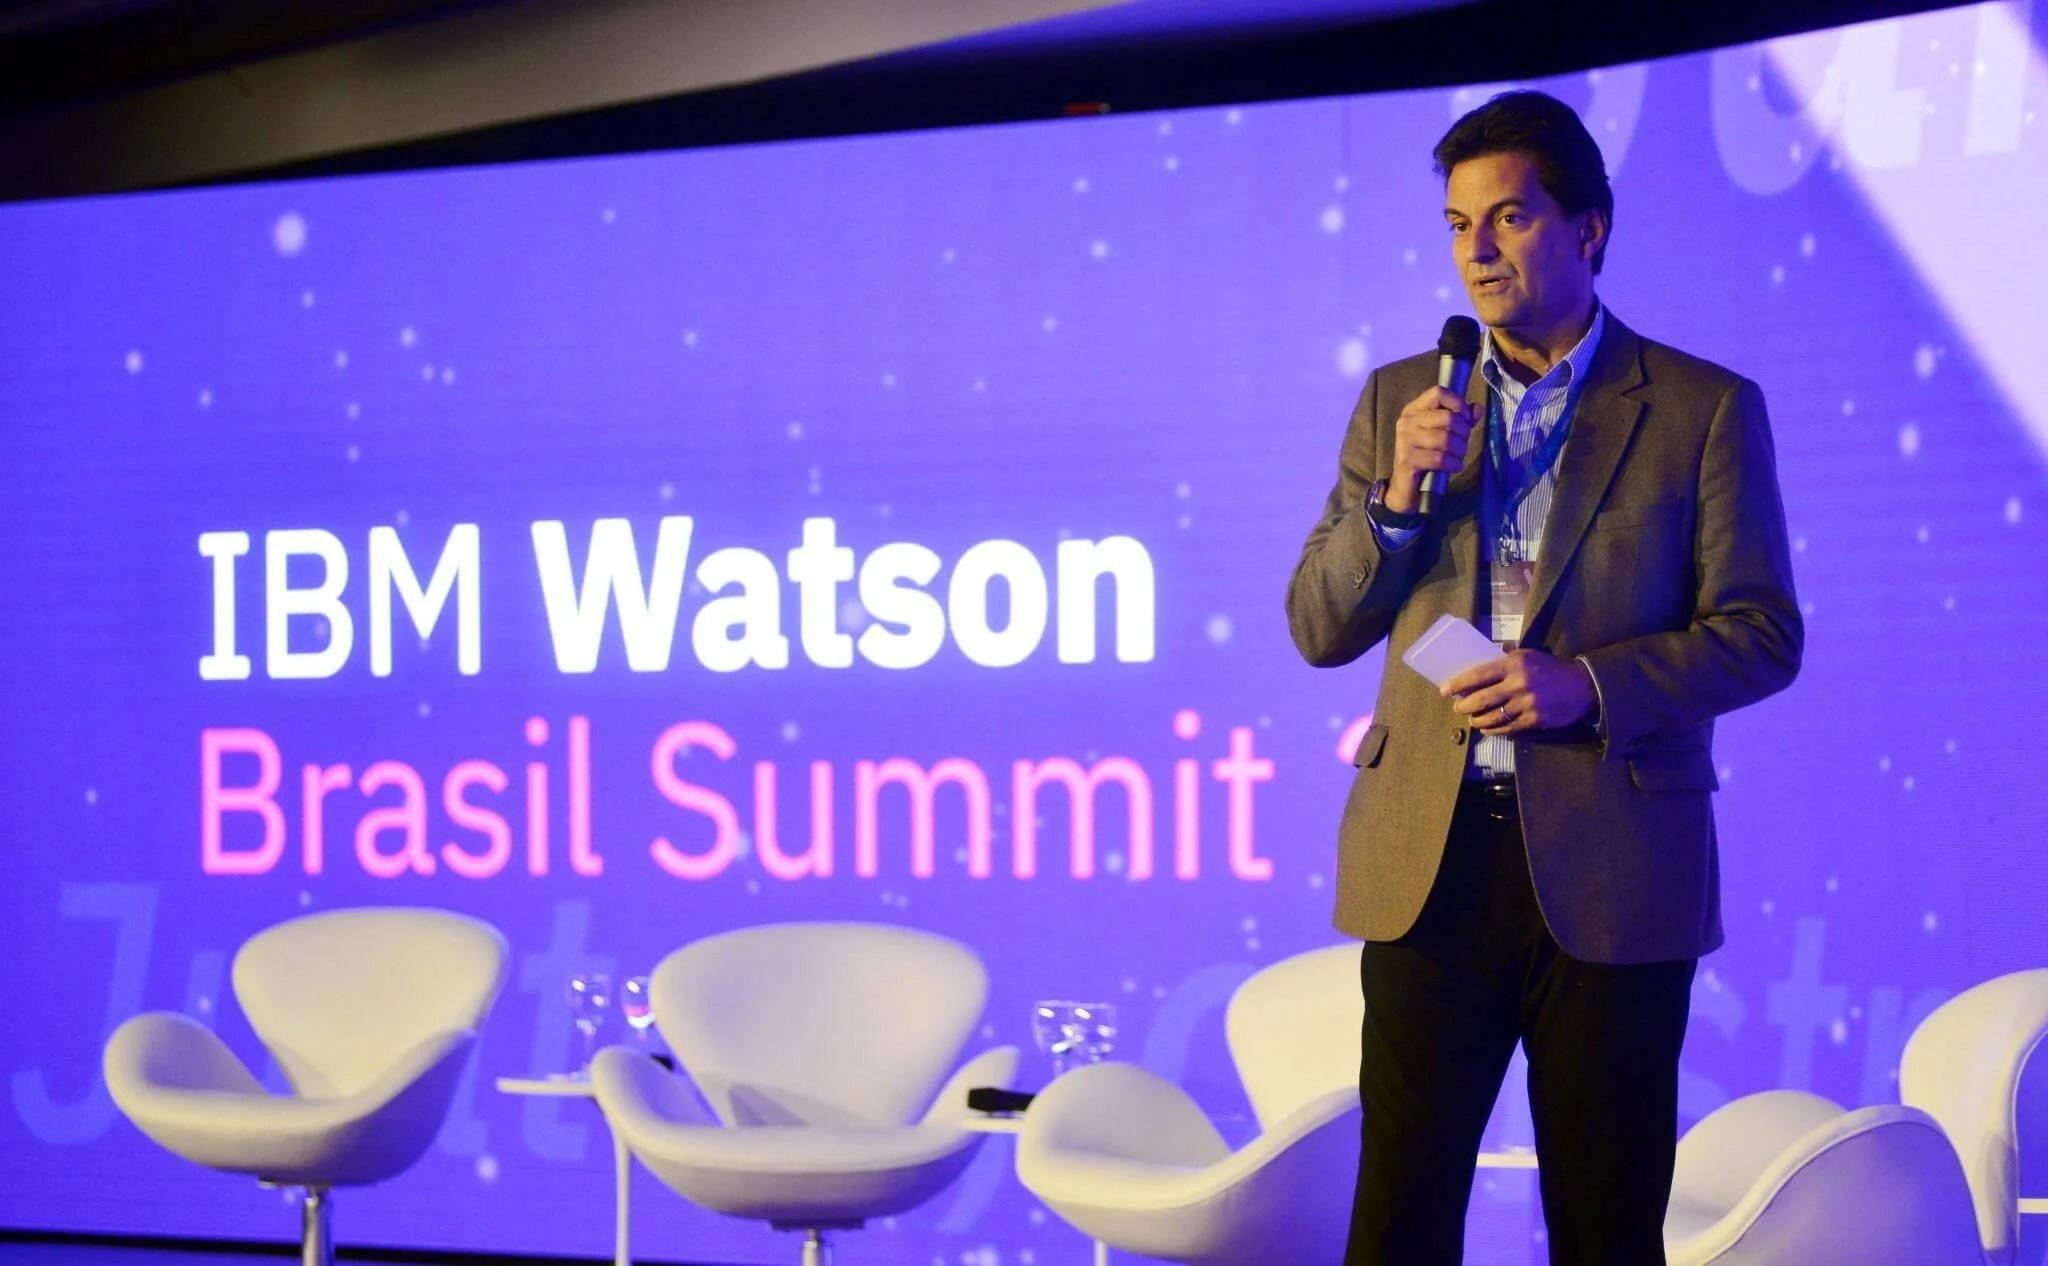 Marcelo Porto presidente da IBM no Brasil - O IBM Watson Summit e o futuro das máquinas inteligentes